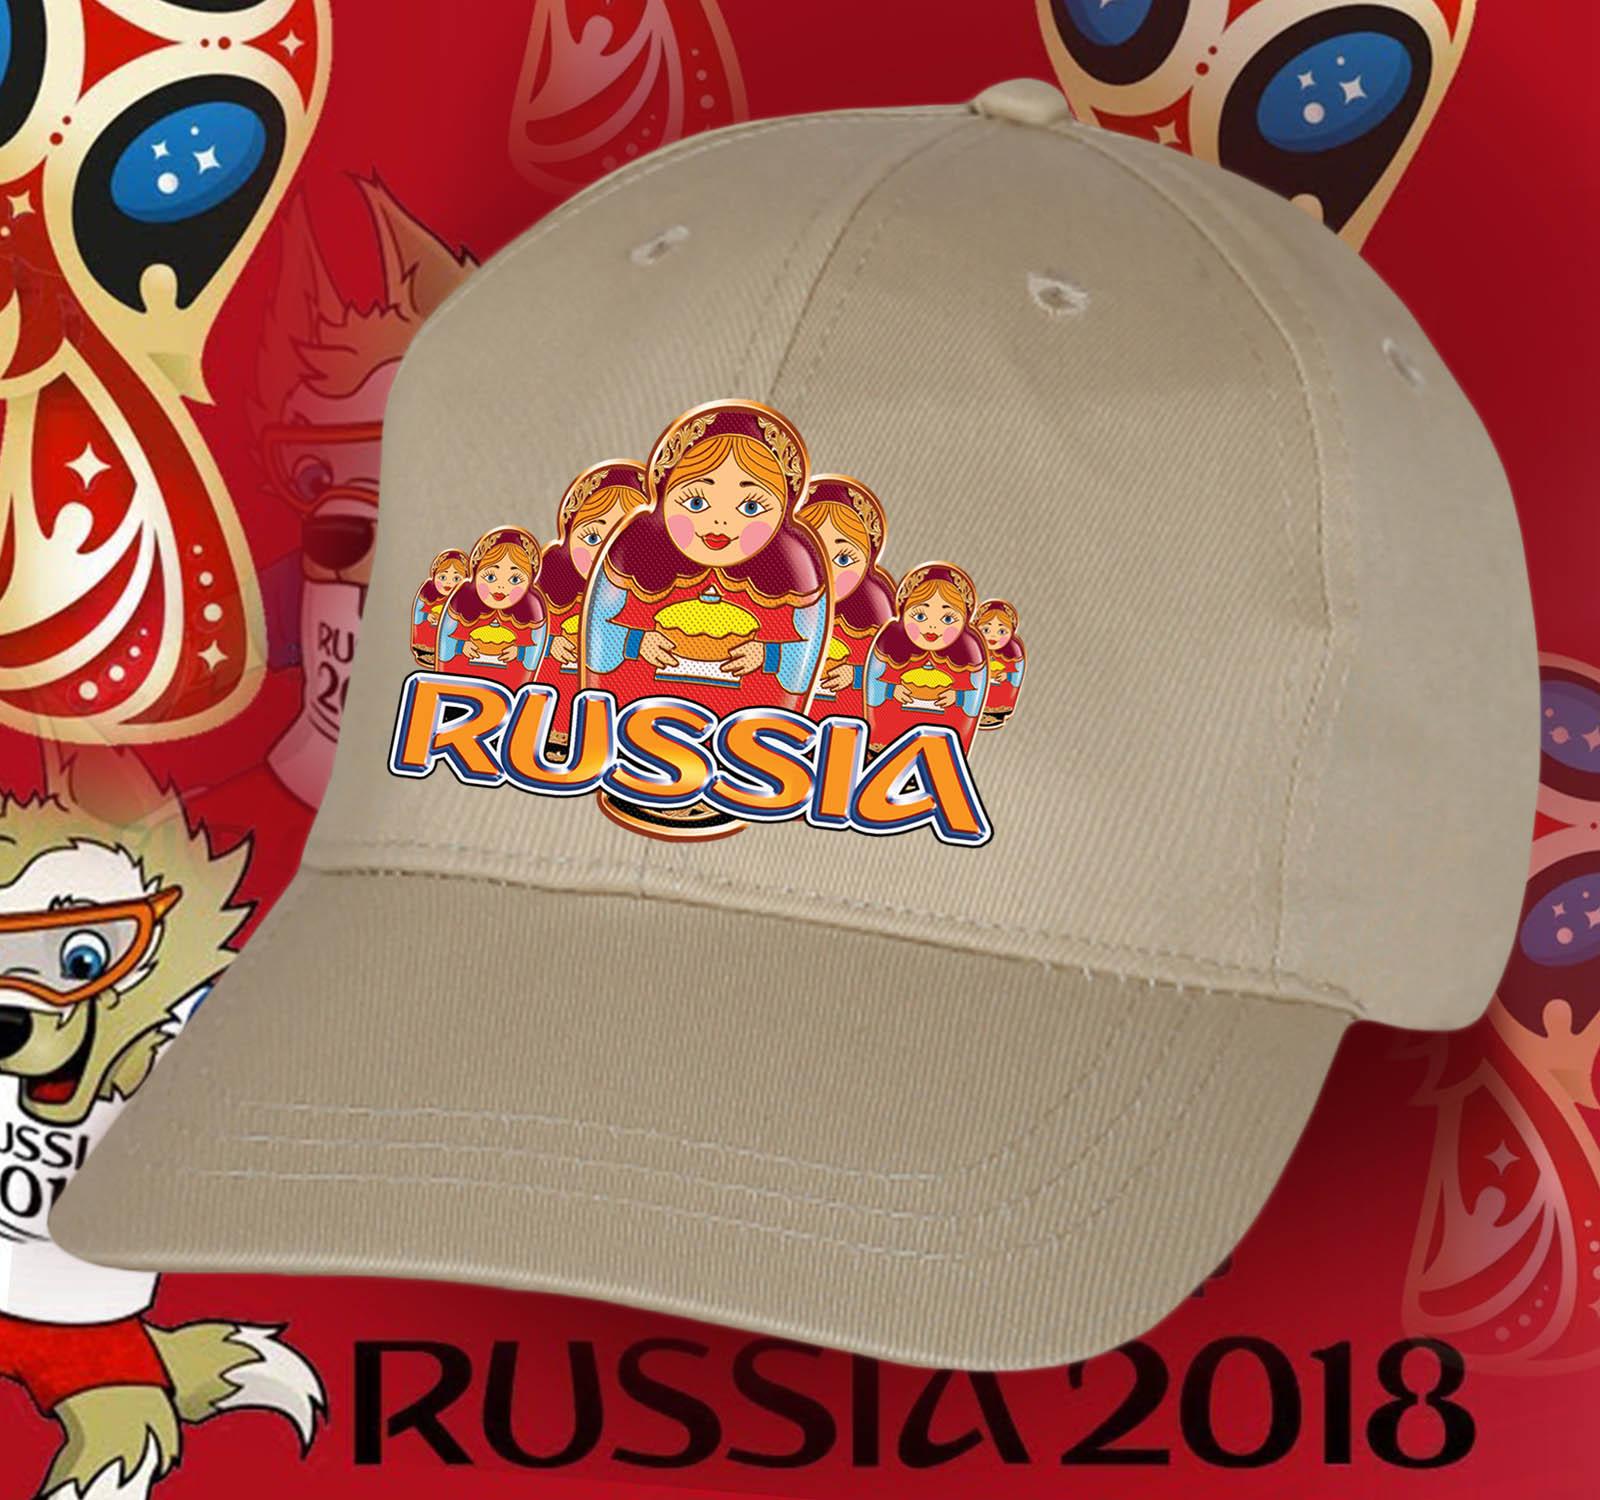 Патриотизм в тренде! Бежевая бейсболка RUSSIA